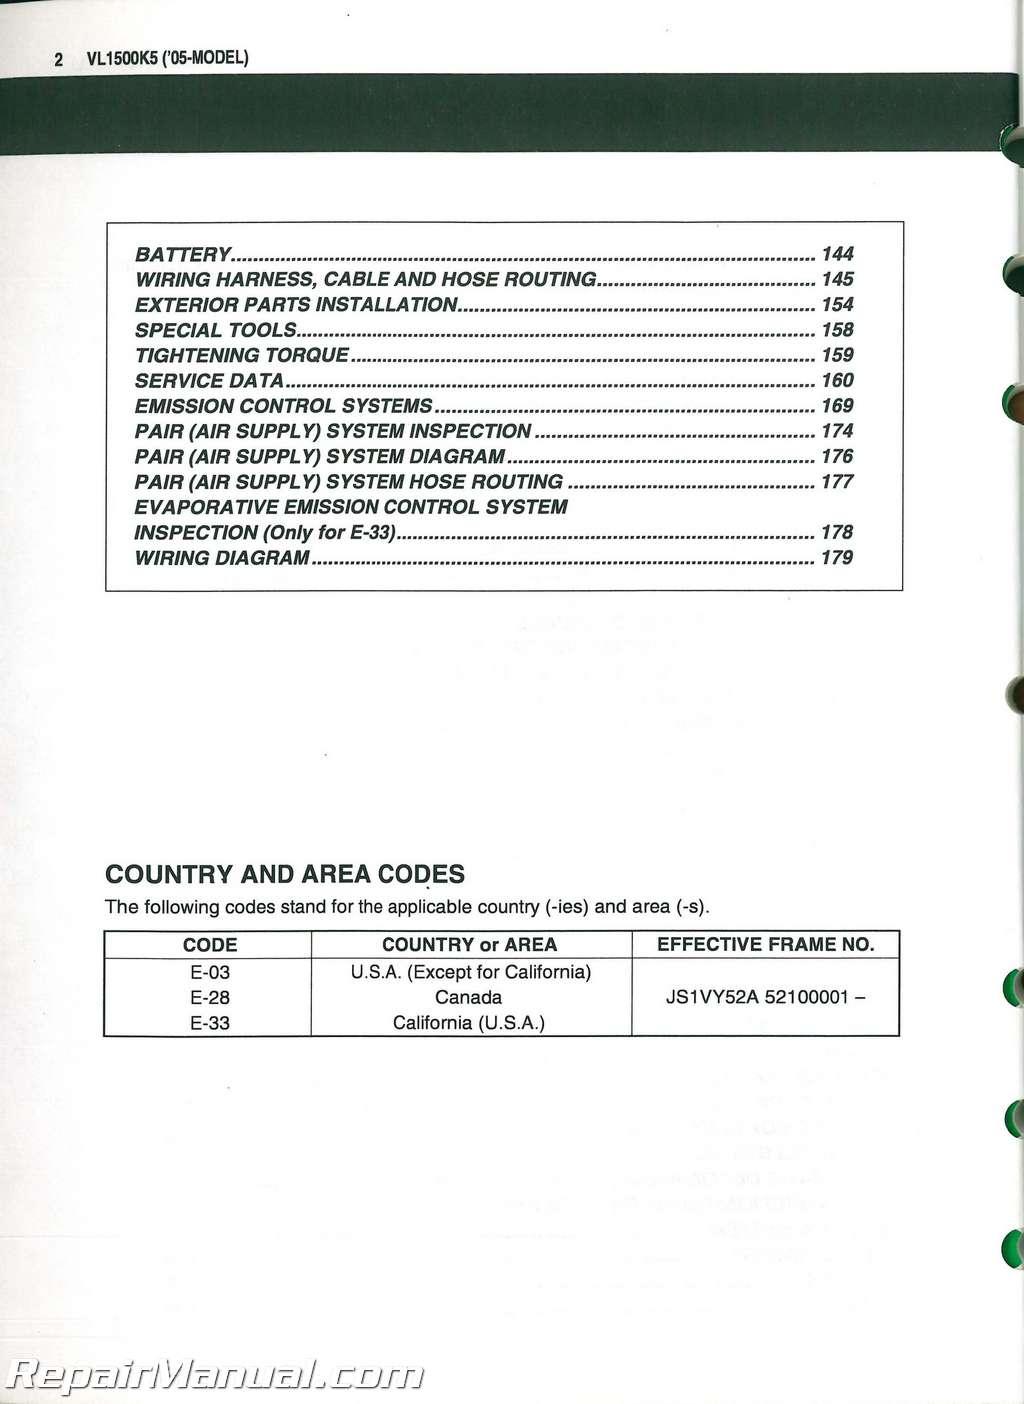 hight resolution of used 2005 suzuki vl1500 intruder c90 motorcycle service manual supplement